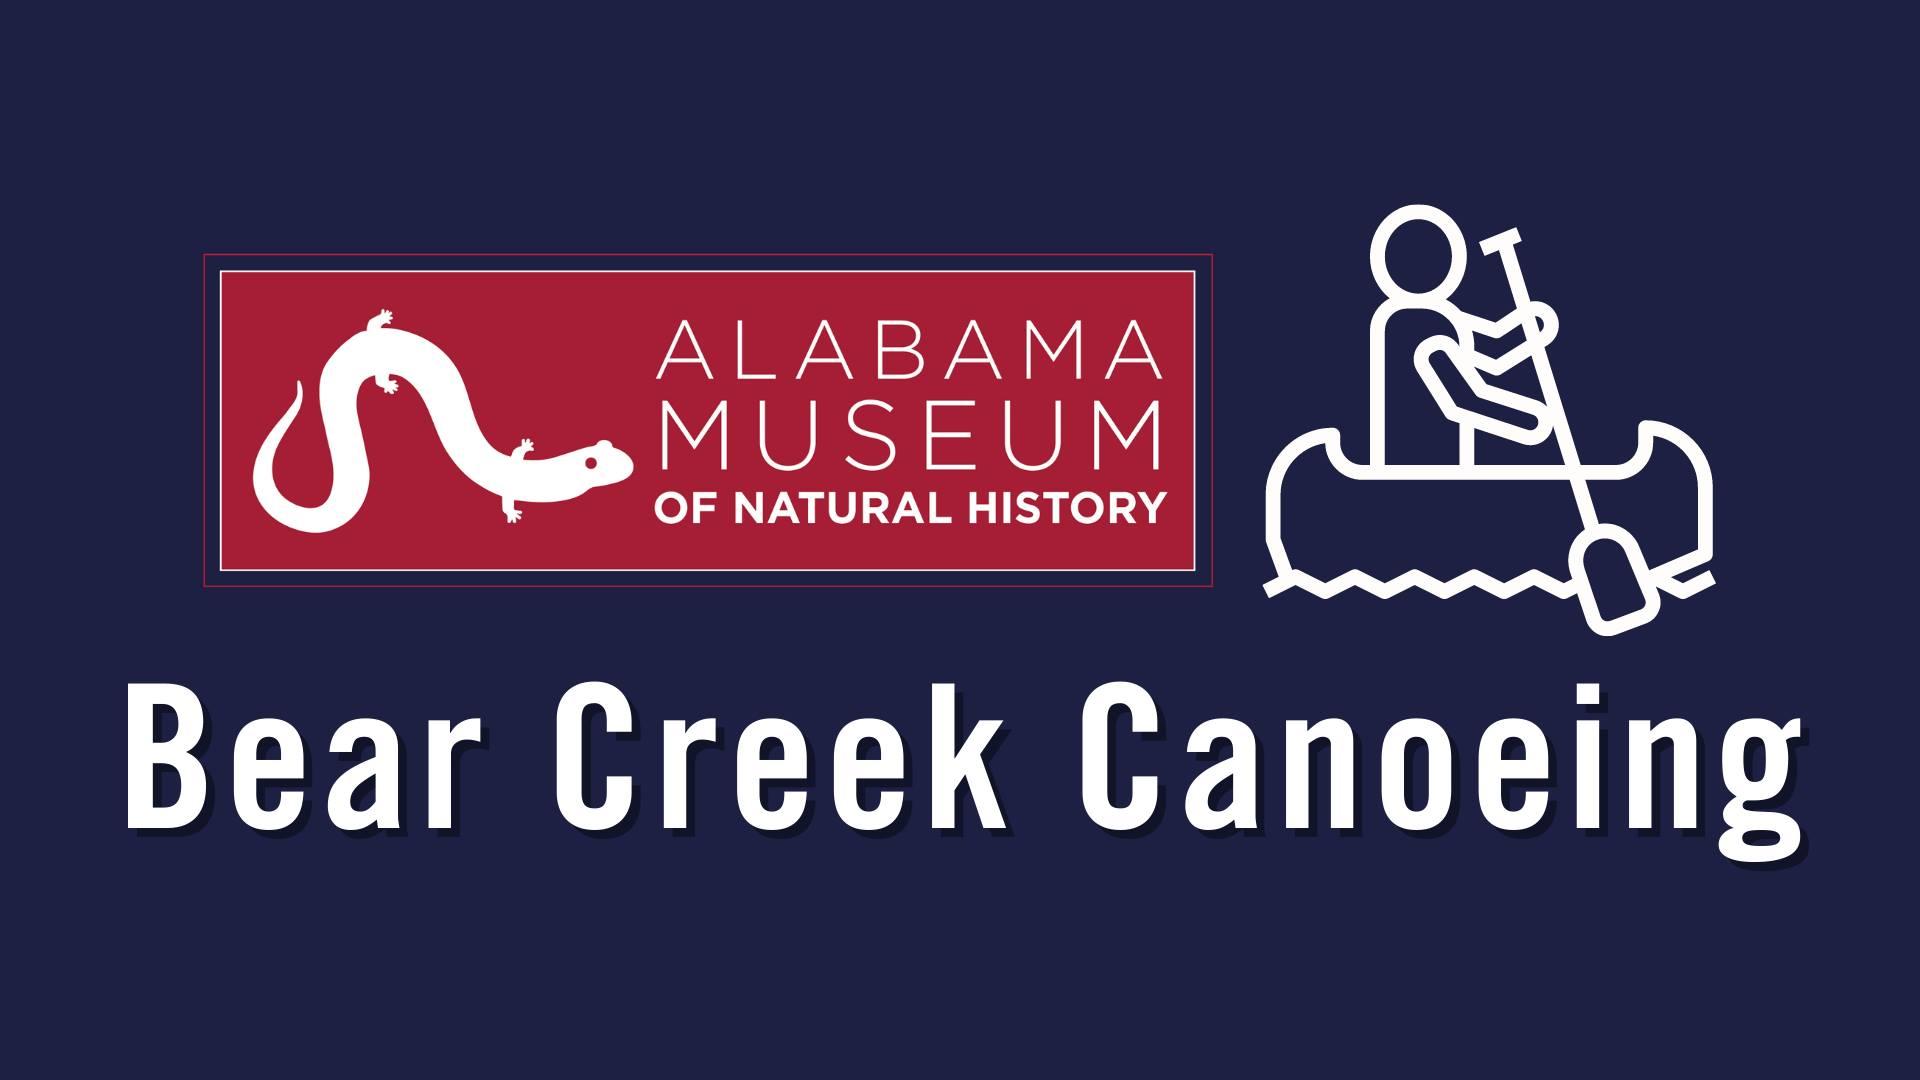 Bear Creek Canoeing